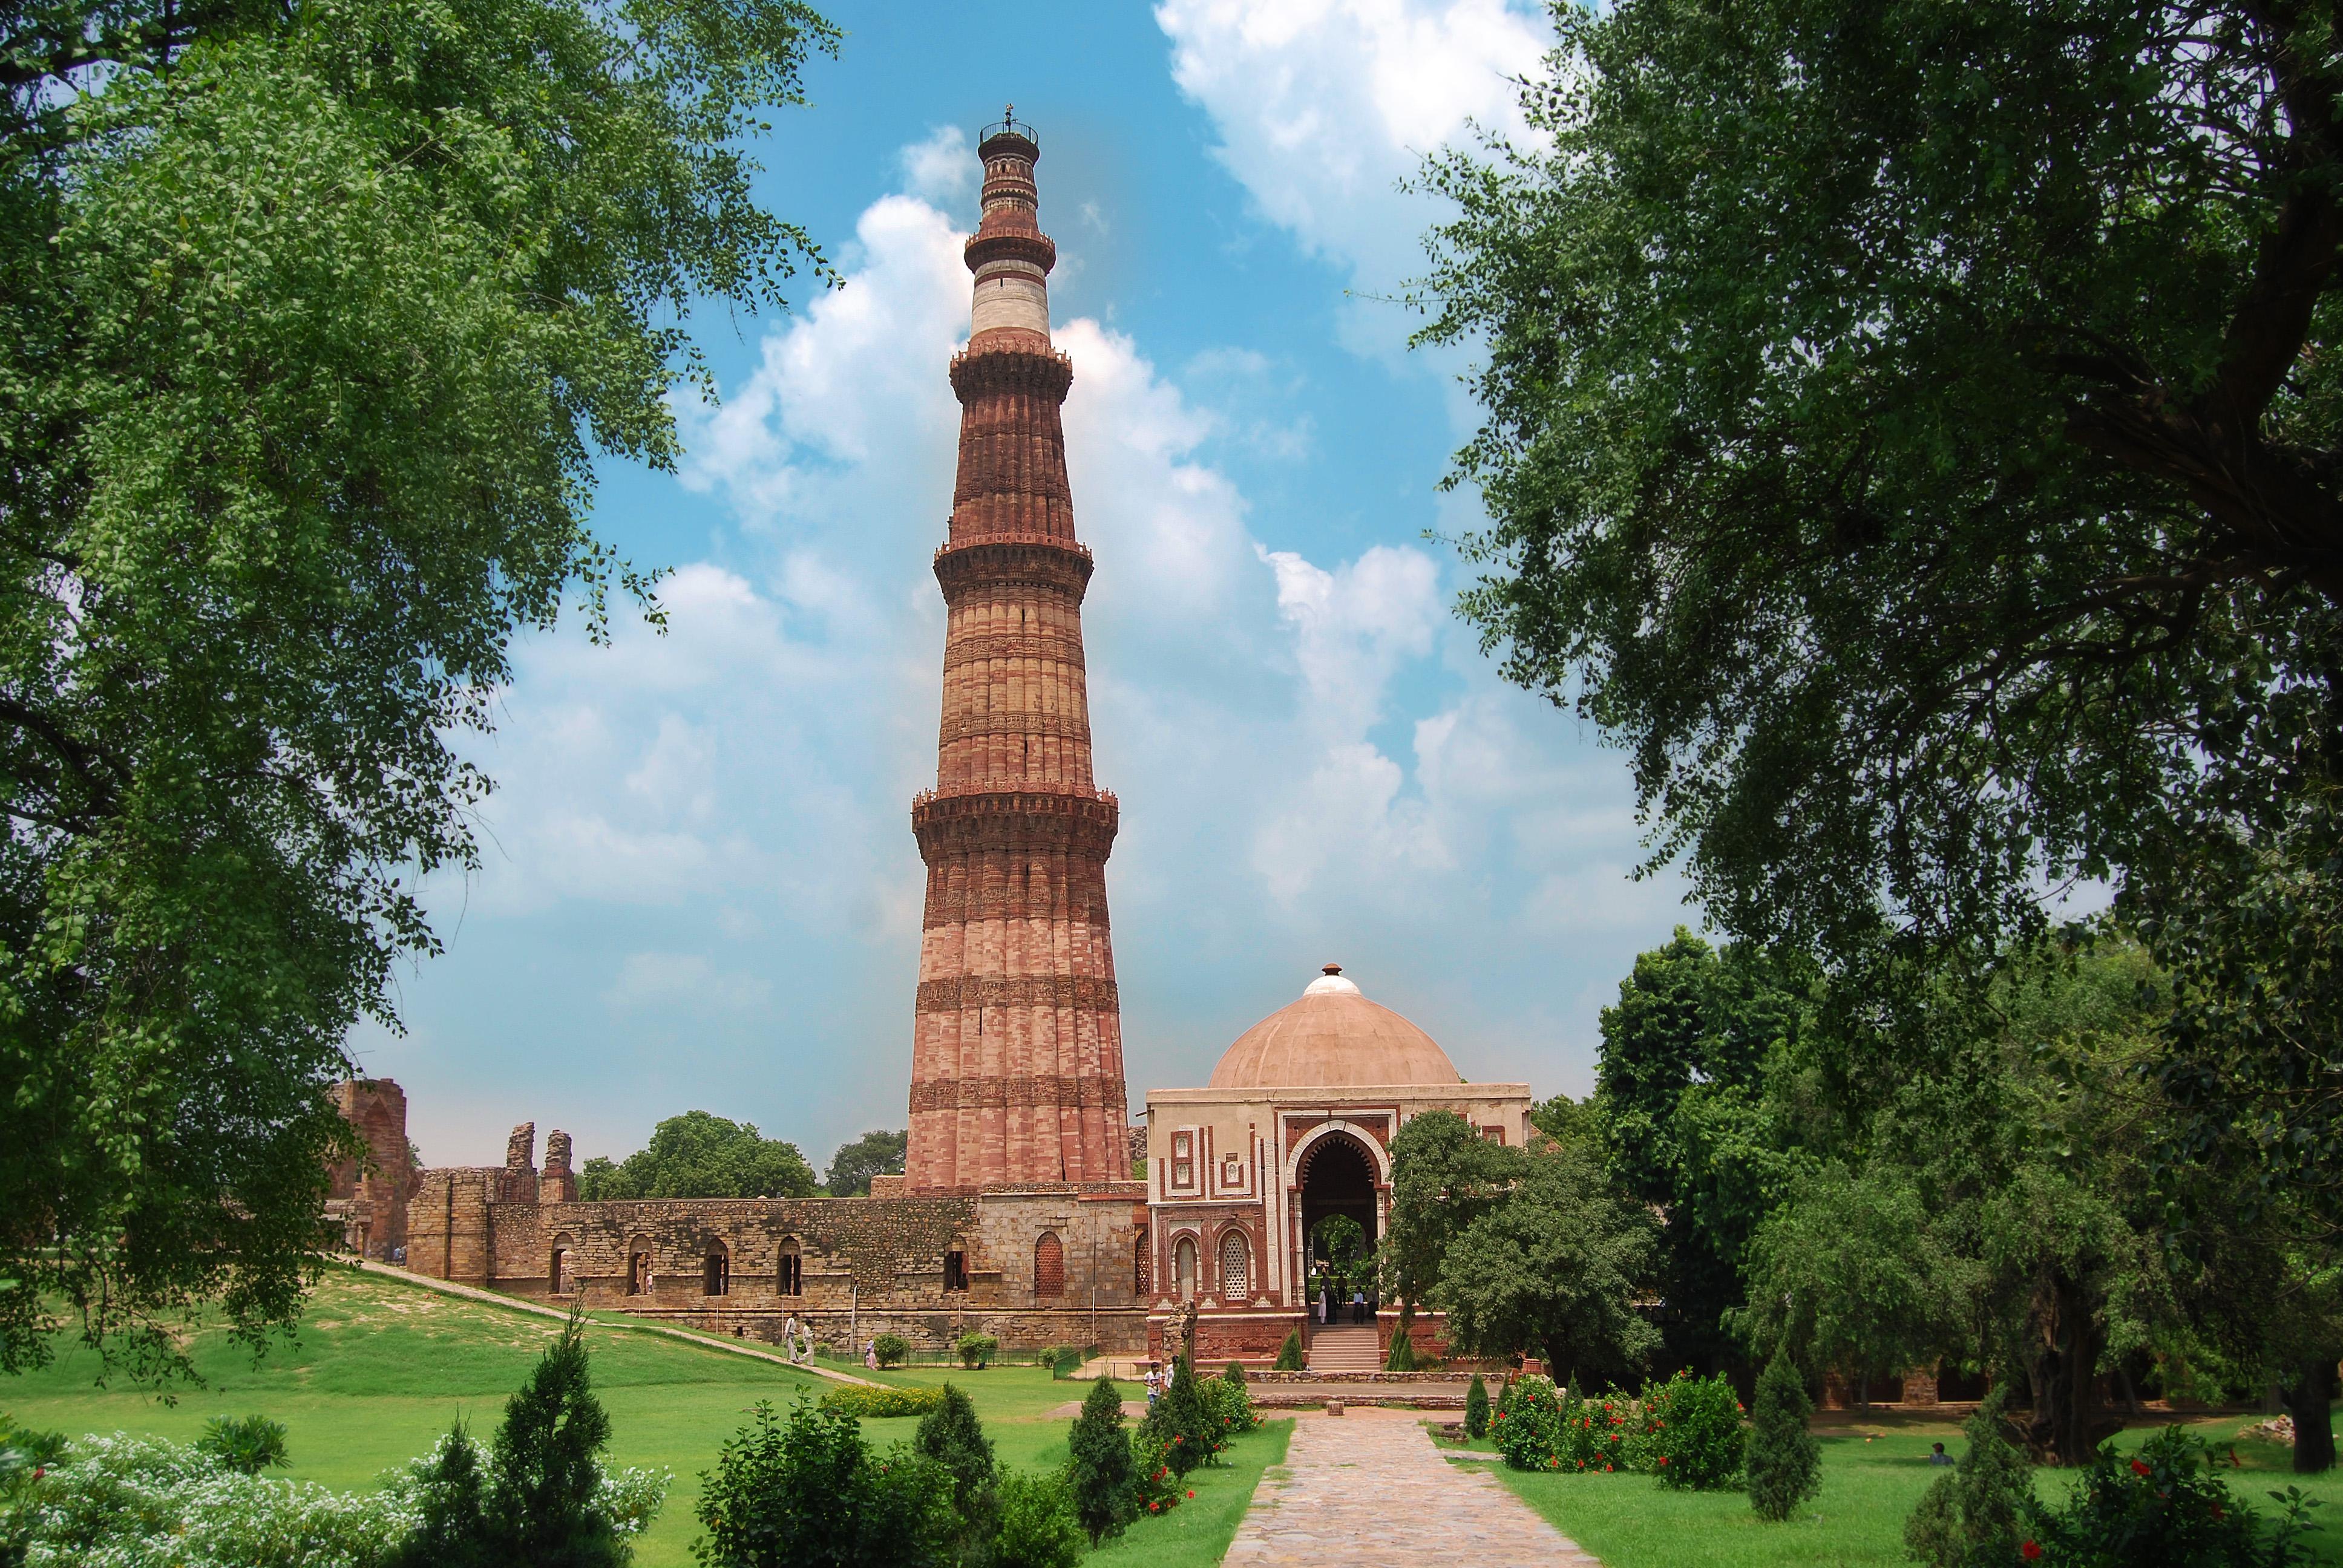 image of Qutub Minar